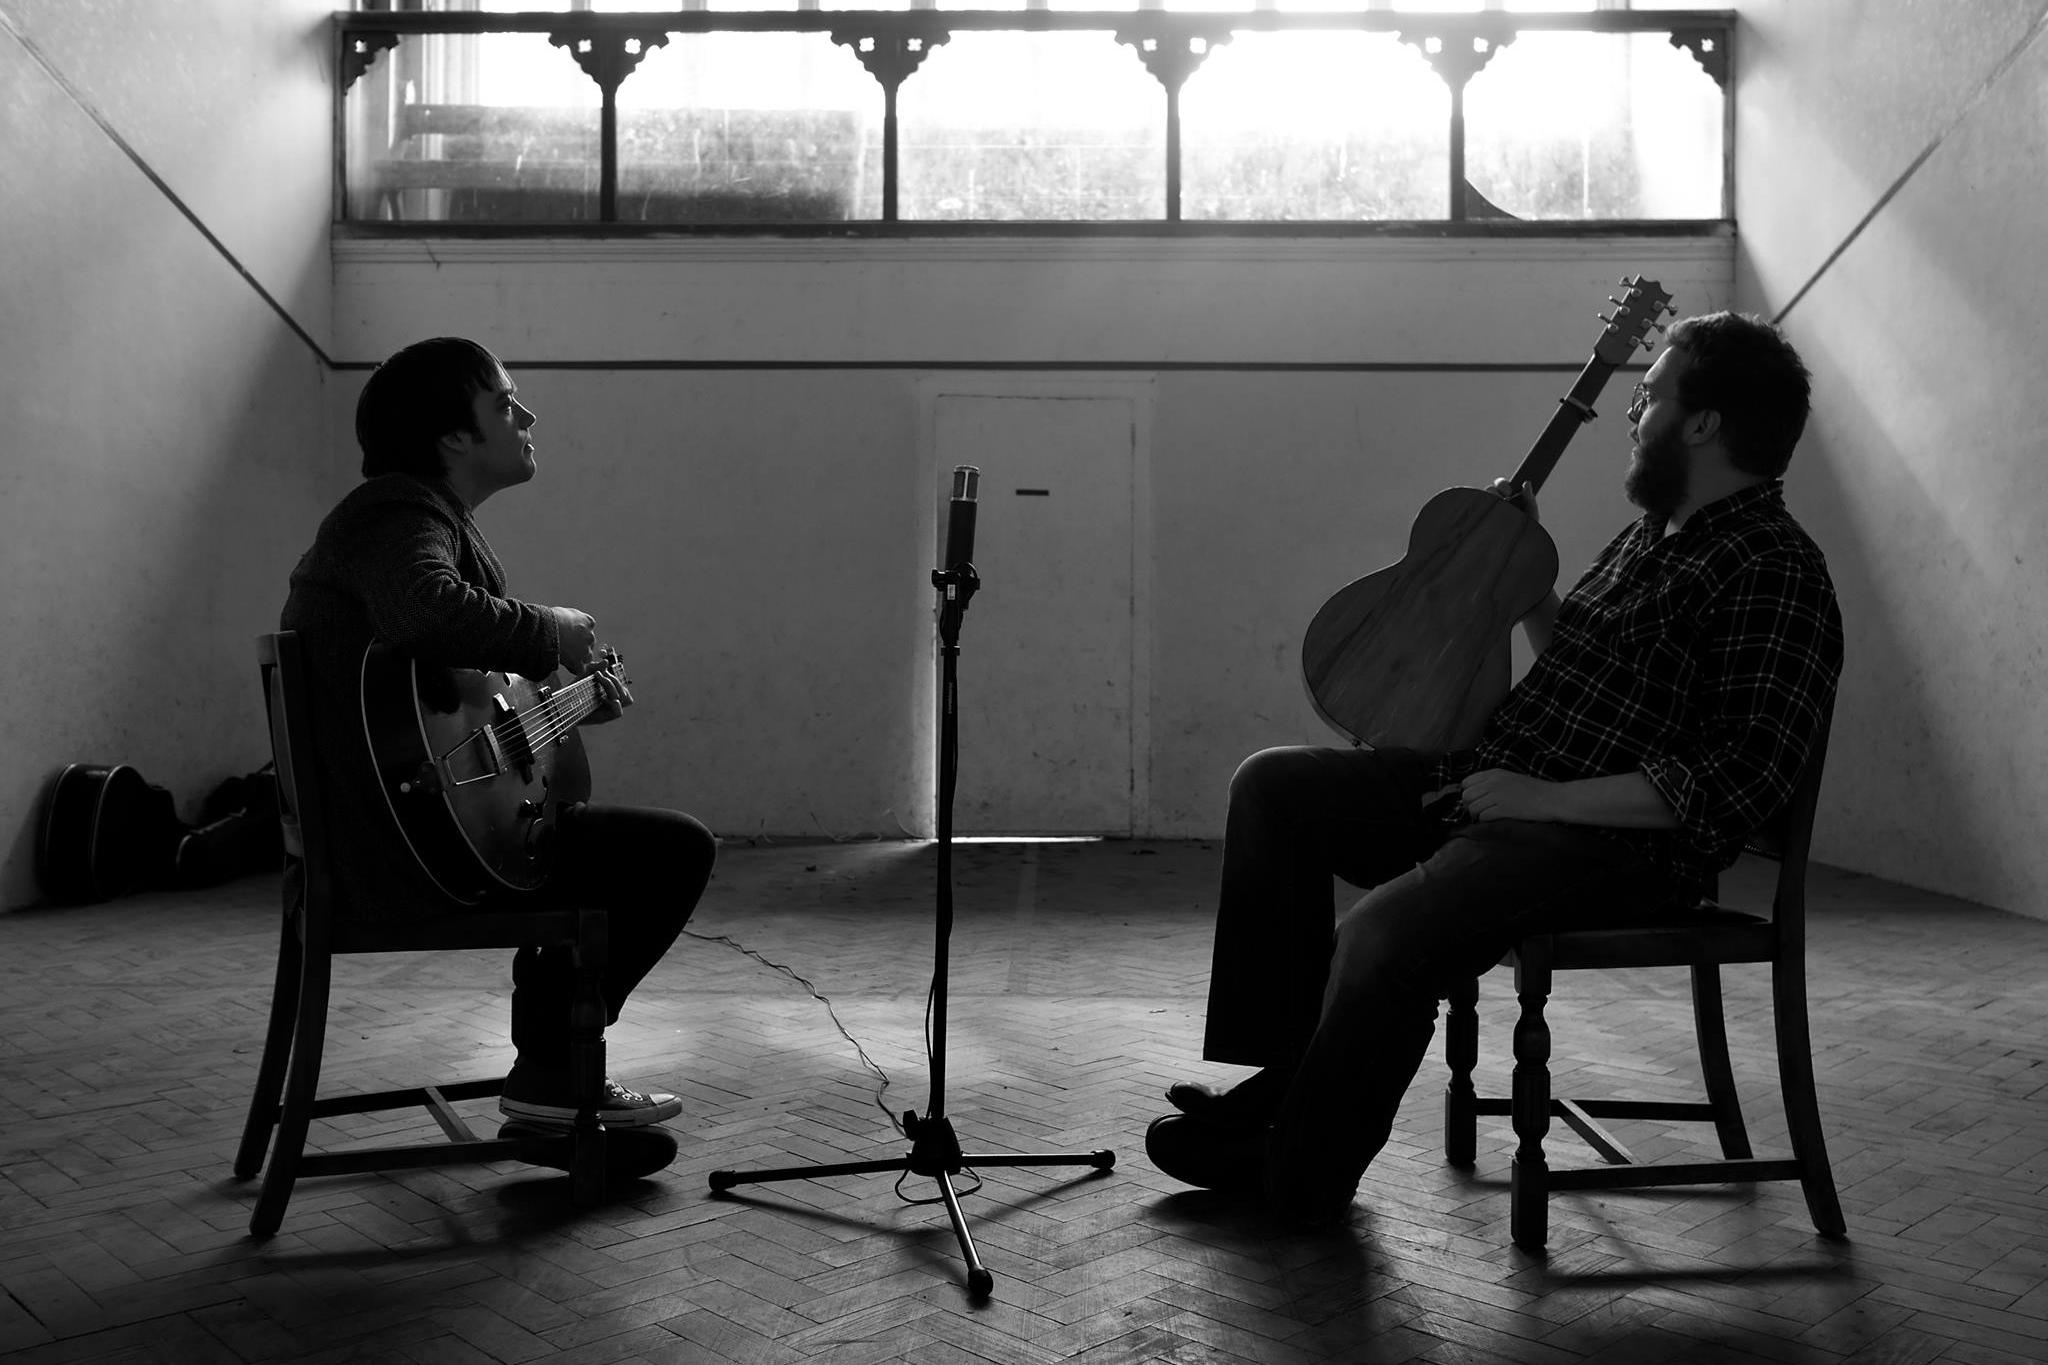 Ben Smith & Jimmy Brewer (UK)